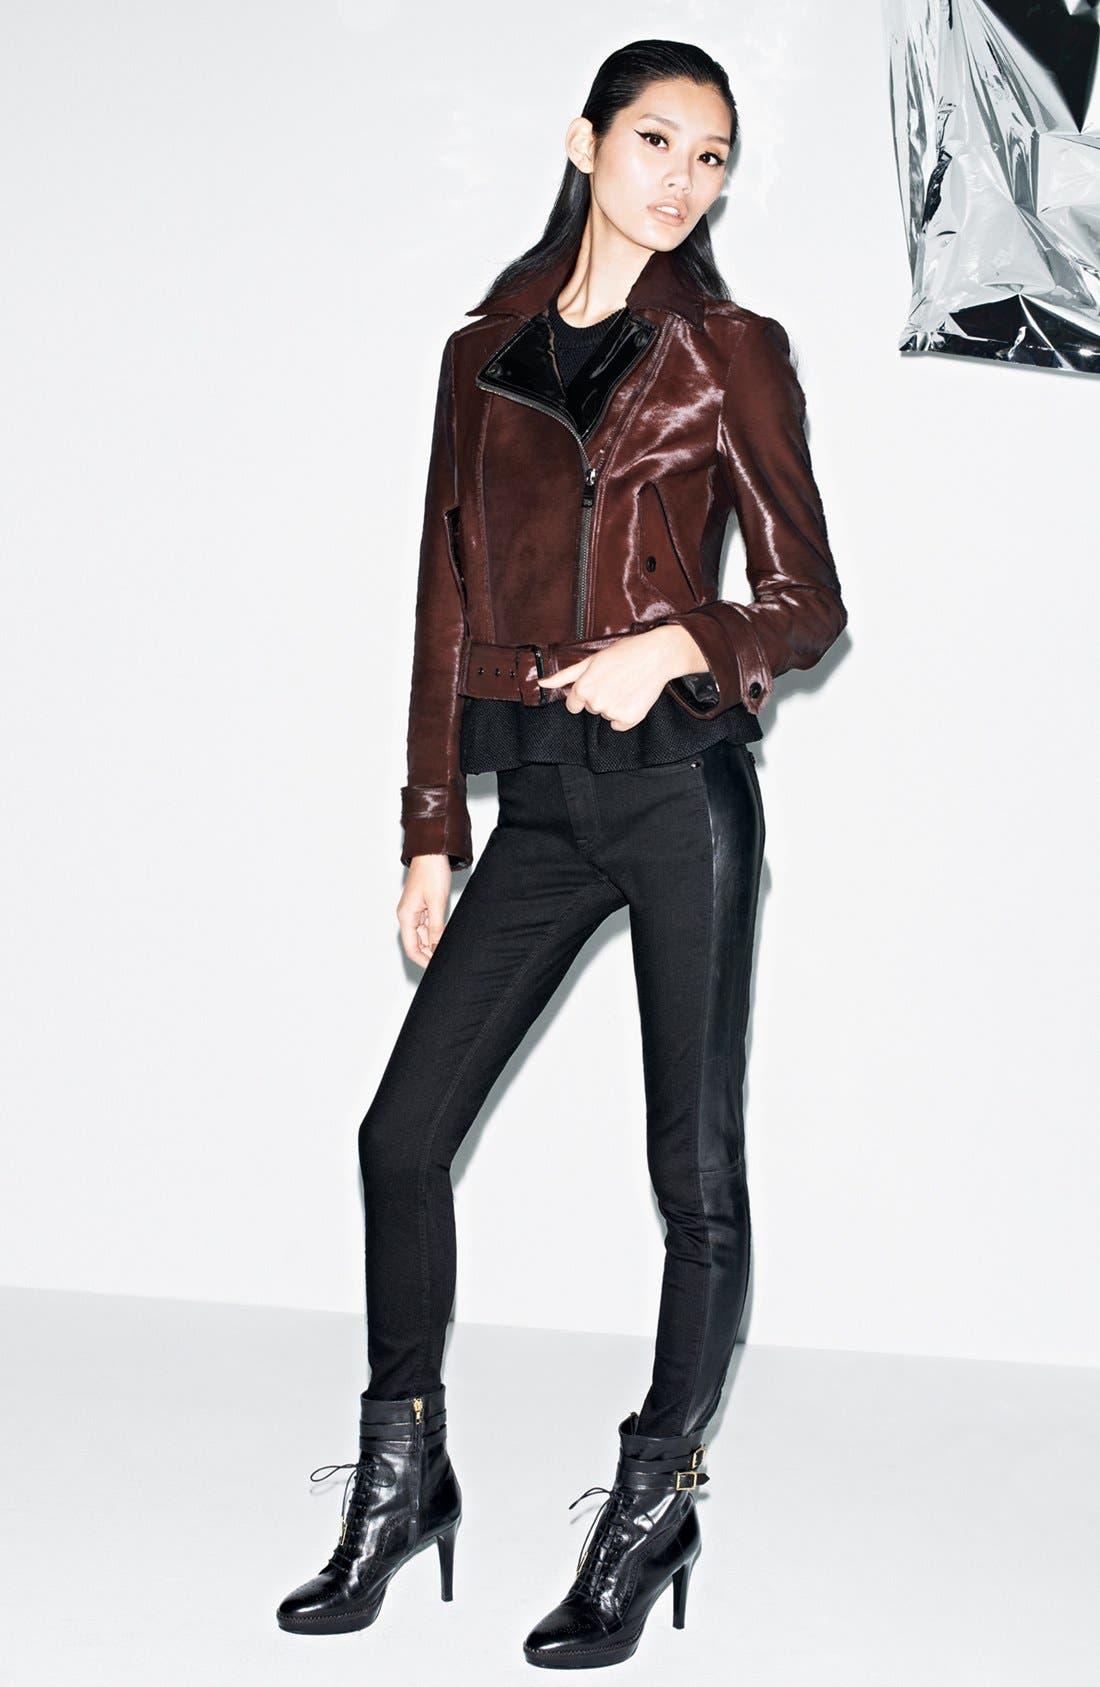 Main Image - Burberry London Moto Jacket, Sweater & Jeans